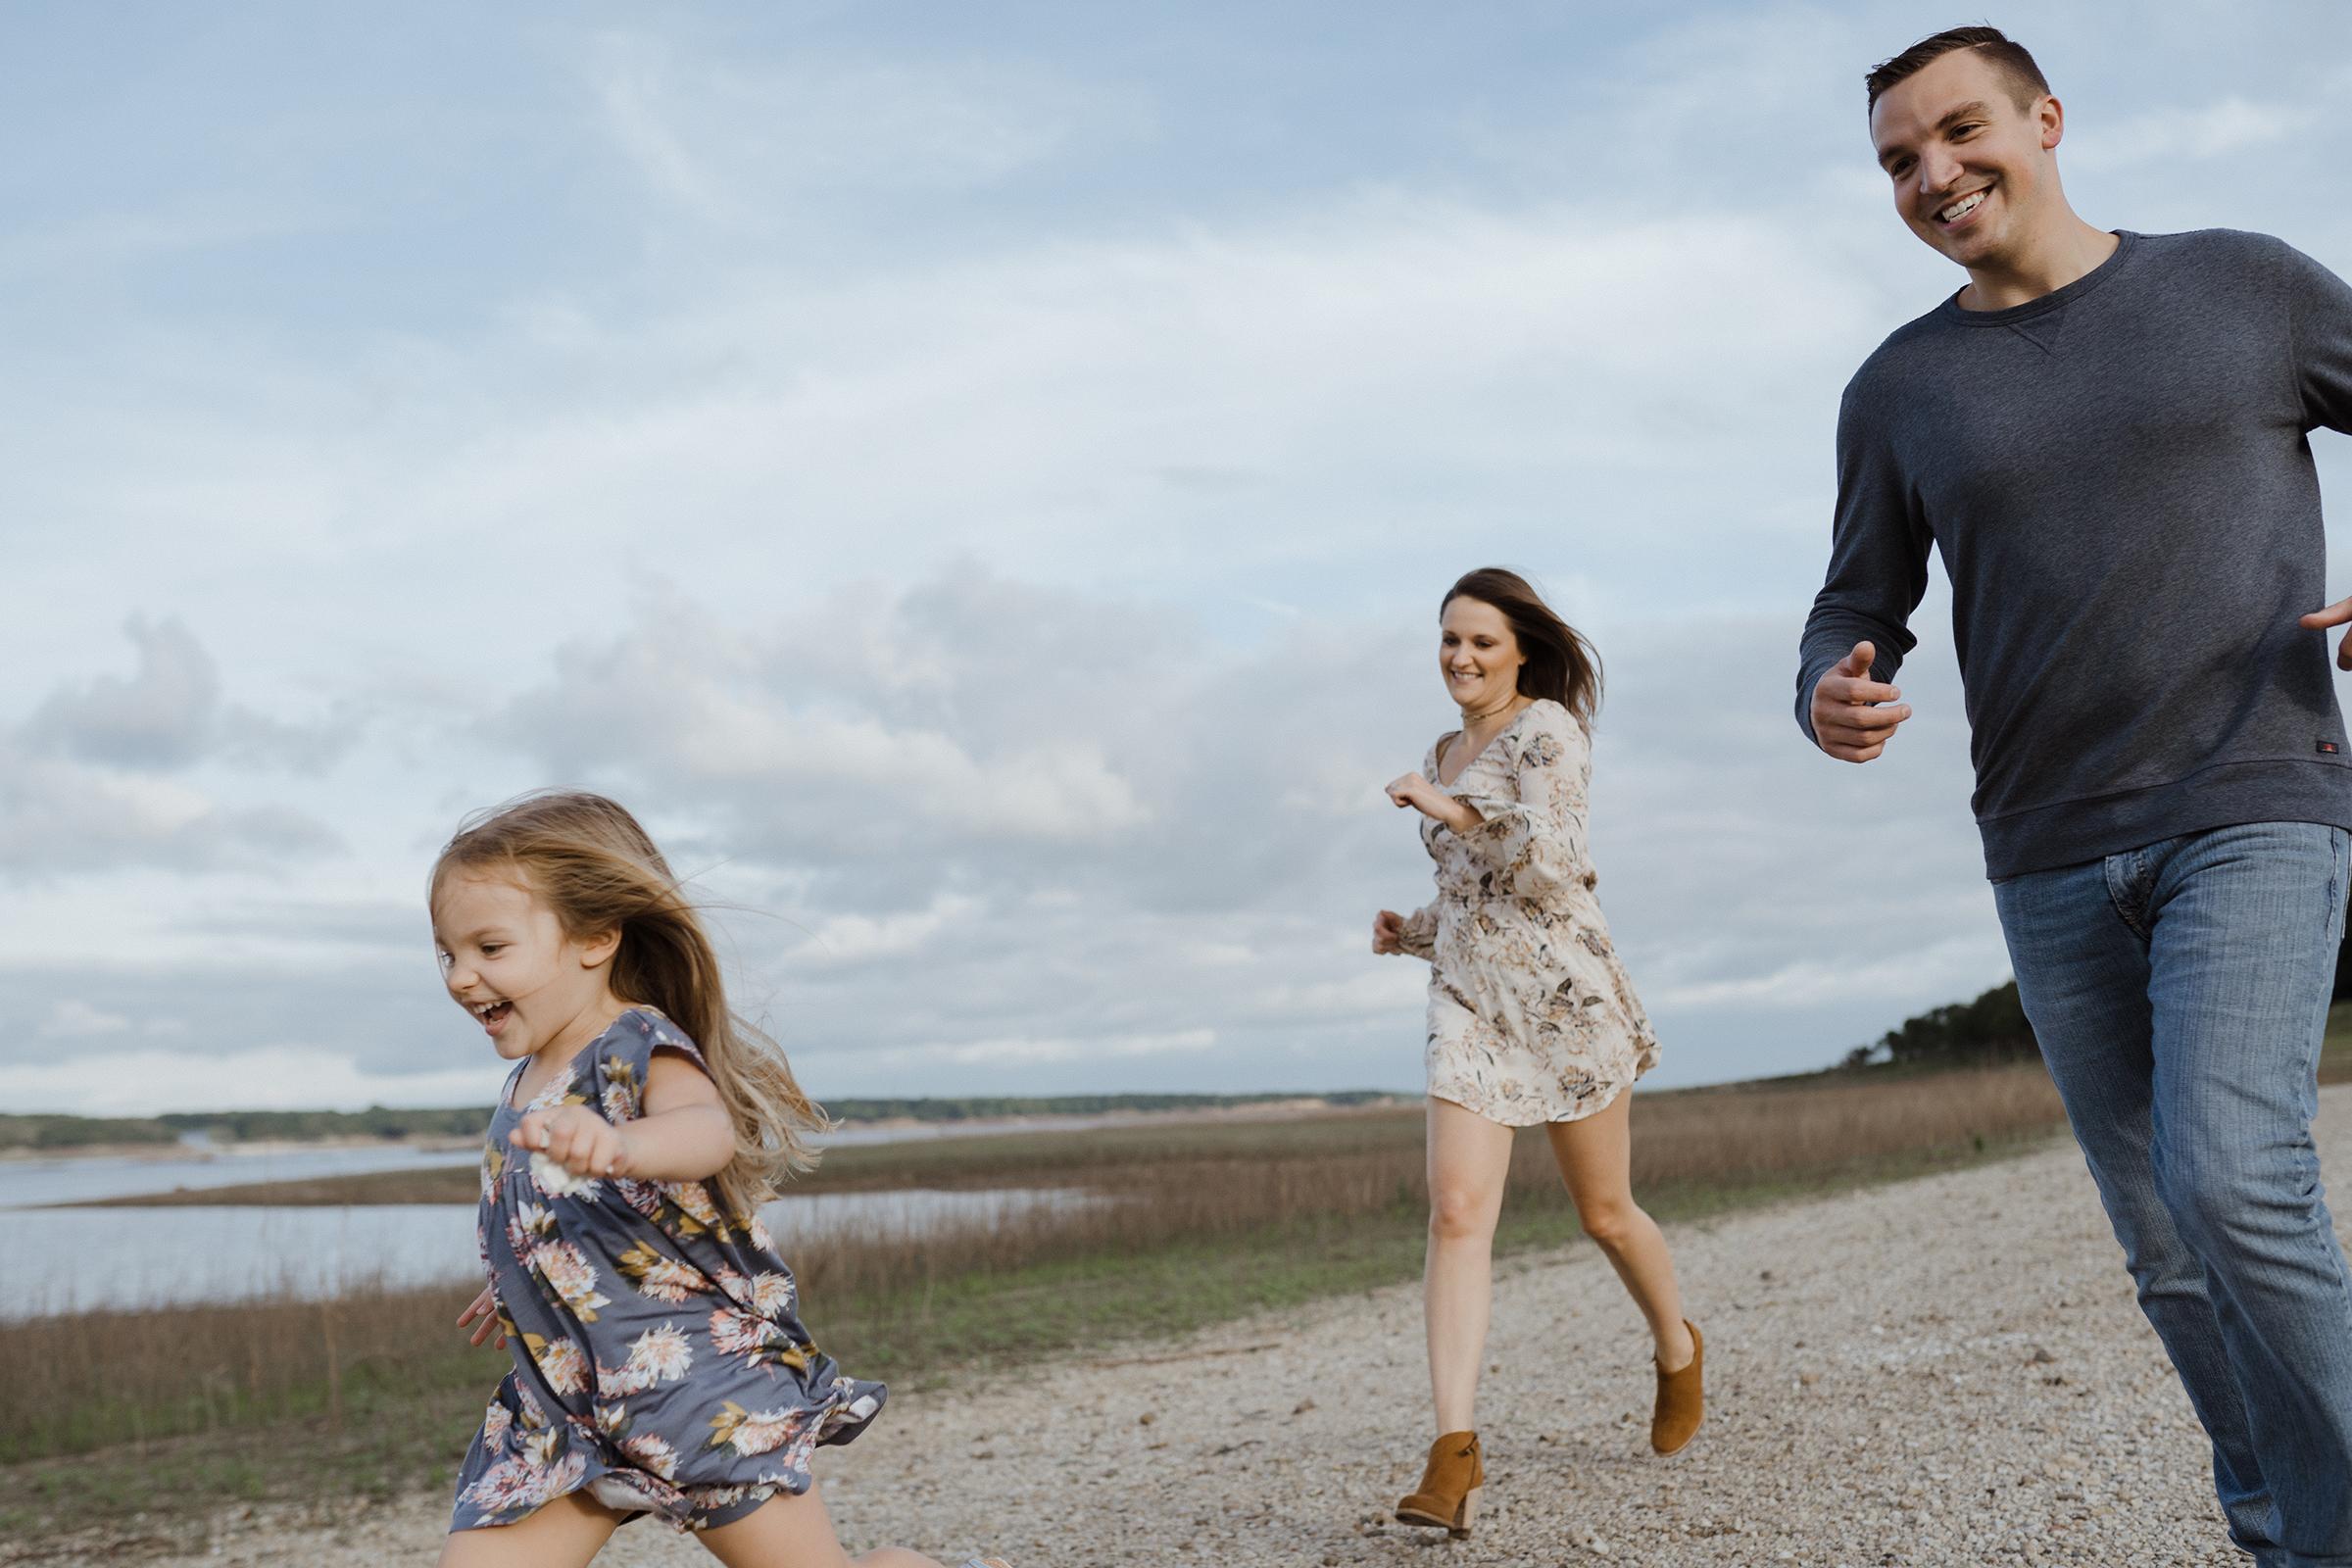 mueller-family-parents-chasing-daughter-granger-iowa-raelyn-ramey-photography.jpg